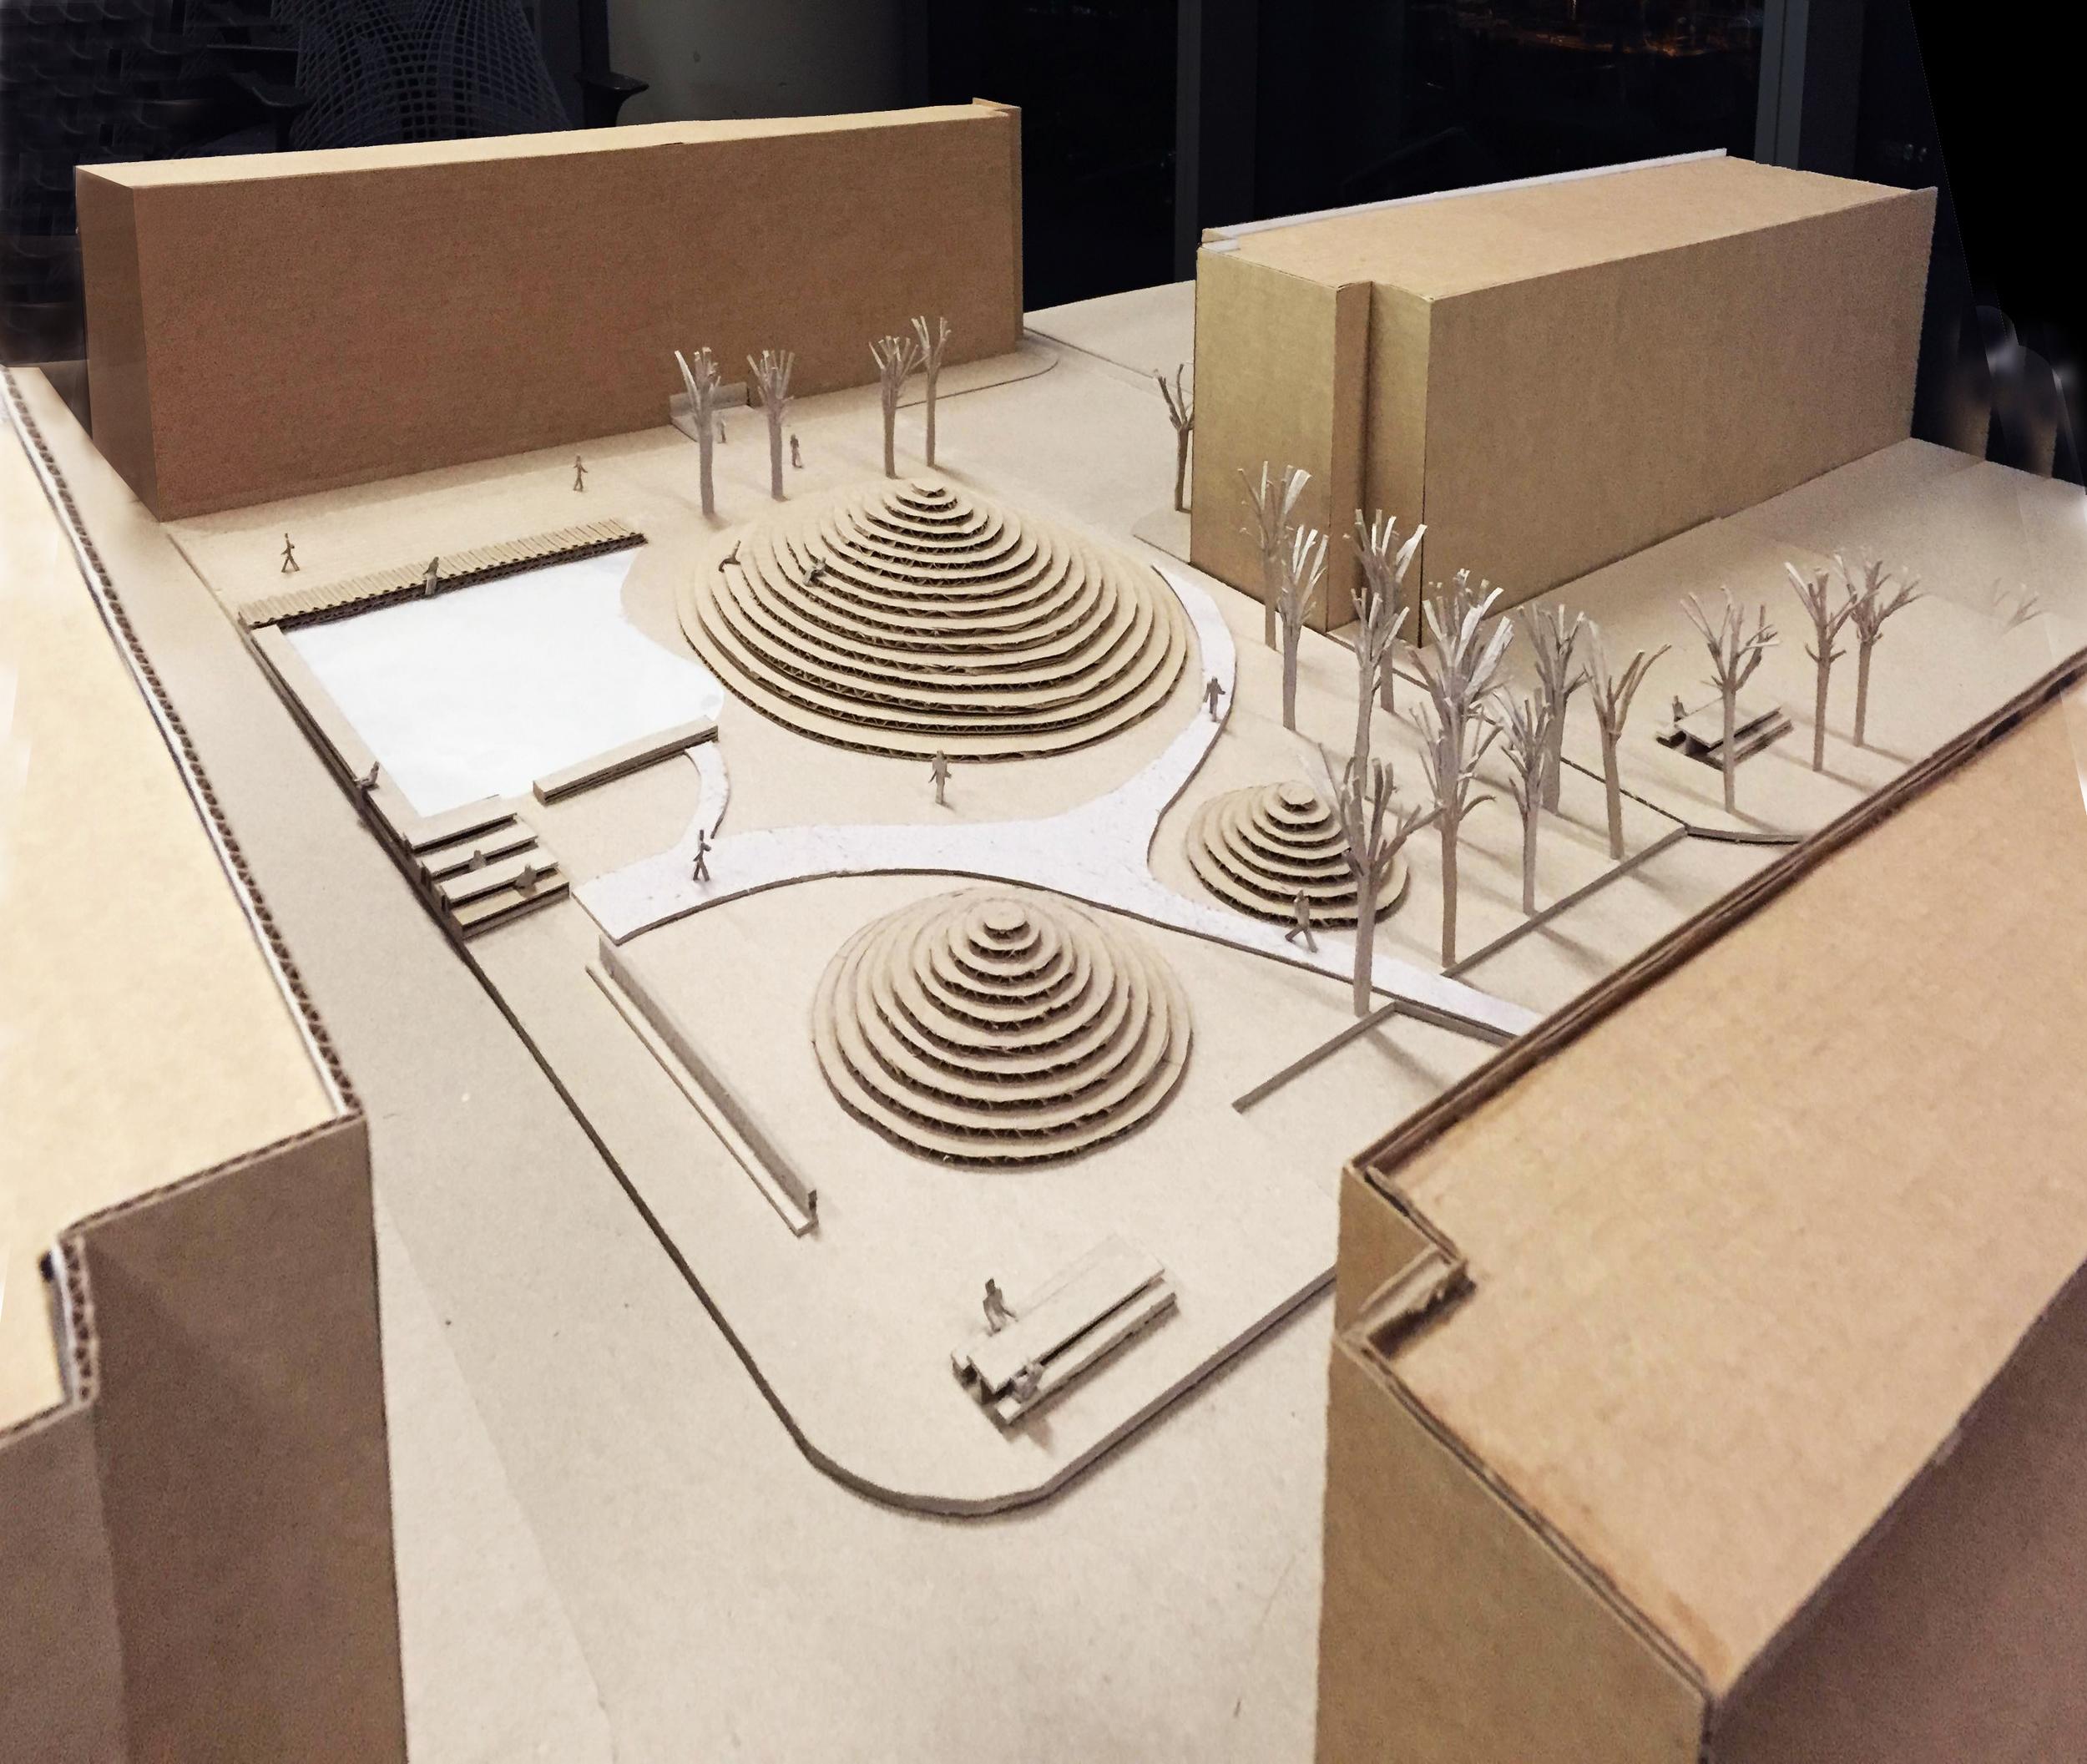 KLabs_Undergraduate Student Quad_Renovation_Cardboard model_2015.jpg